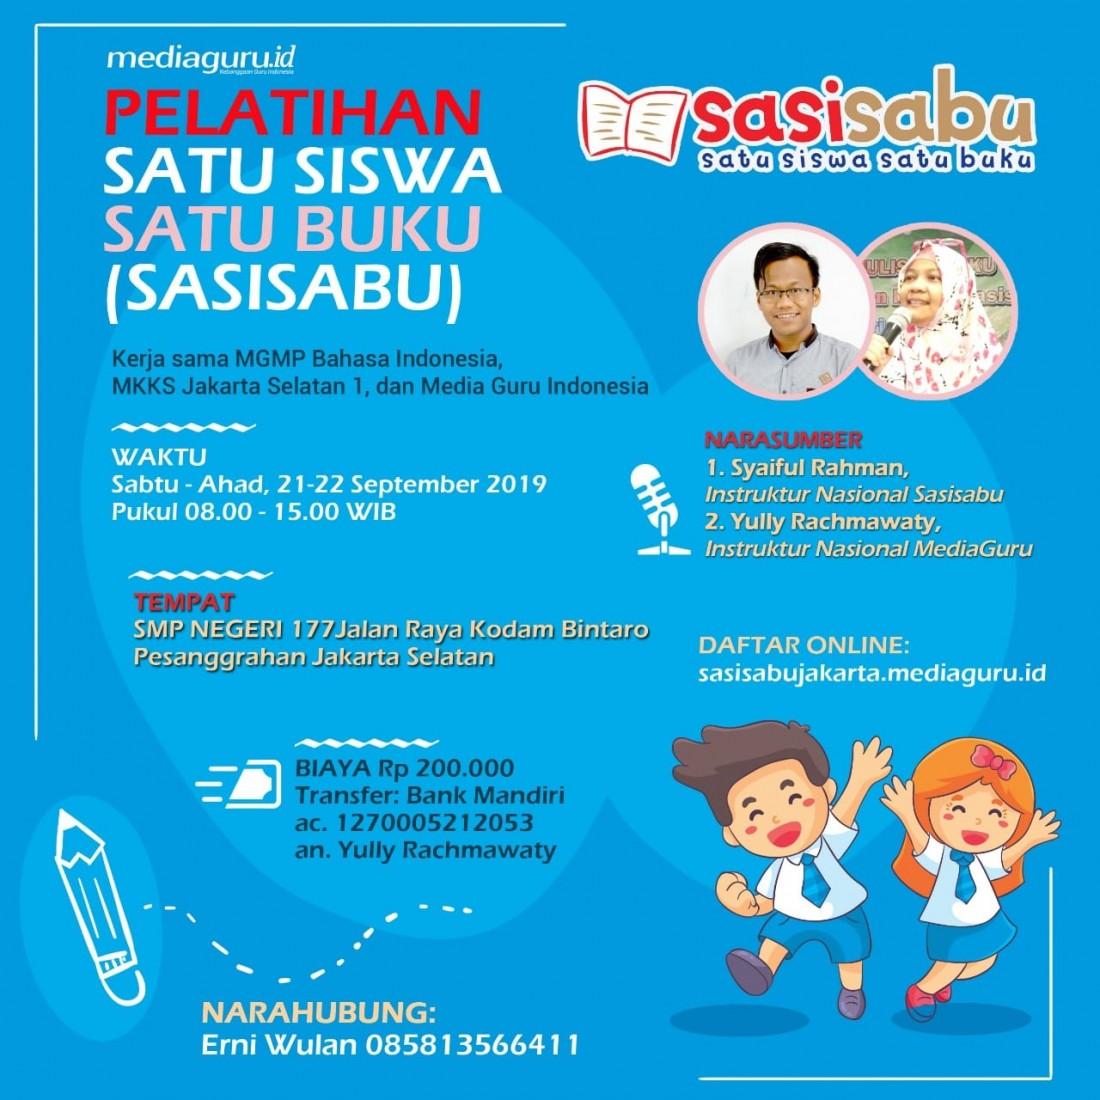 Pelatihan Satu Siswa Satu Buku (Sasisabu) Jakarta (21 - 22 September 2019)